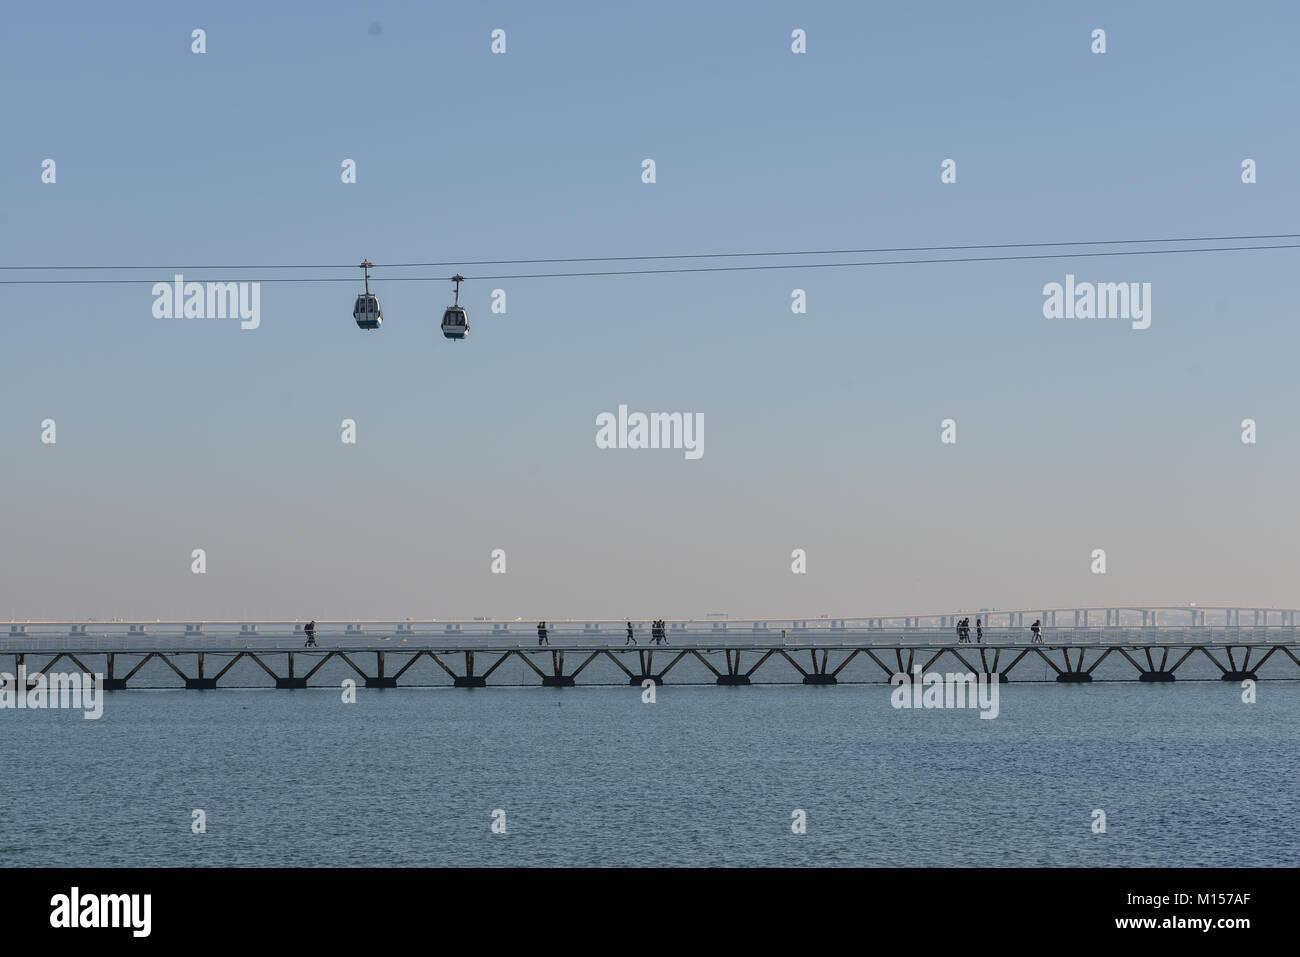 Telecabina on Tago River, Lisbon, Portugal, December 2017 - Stock Image